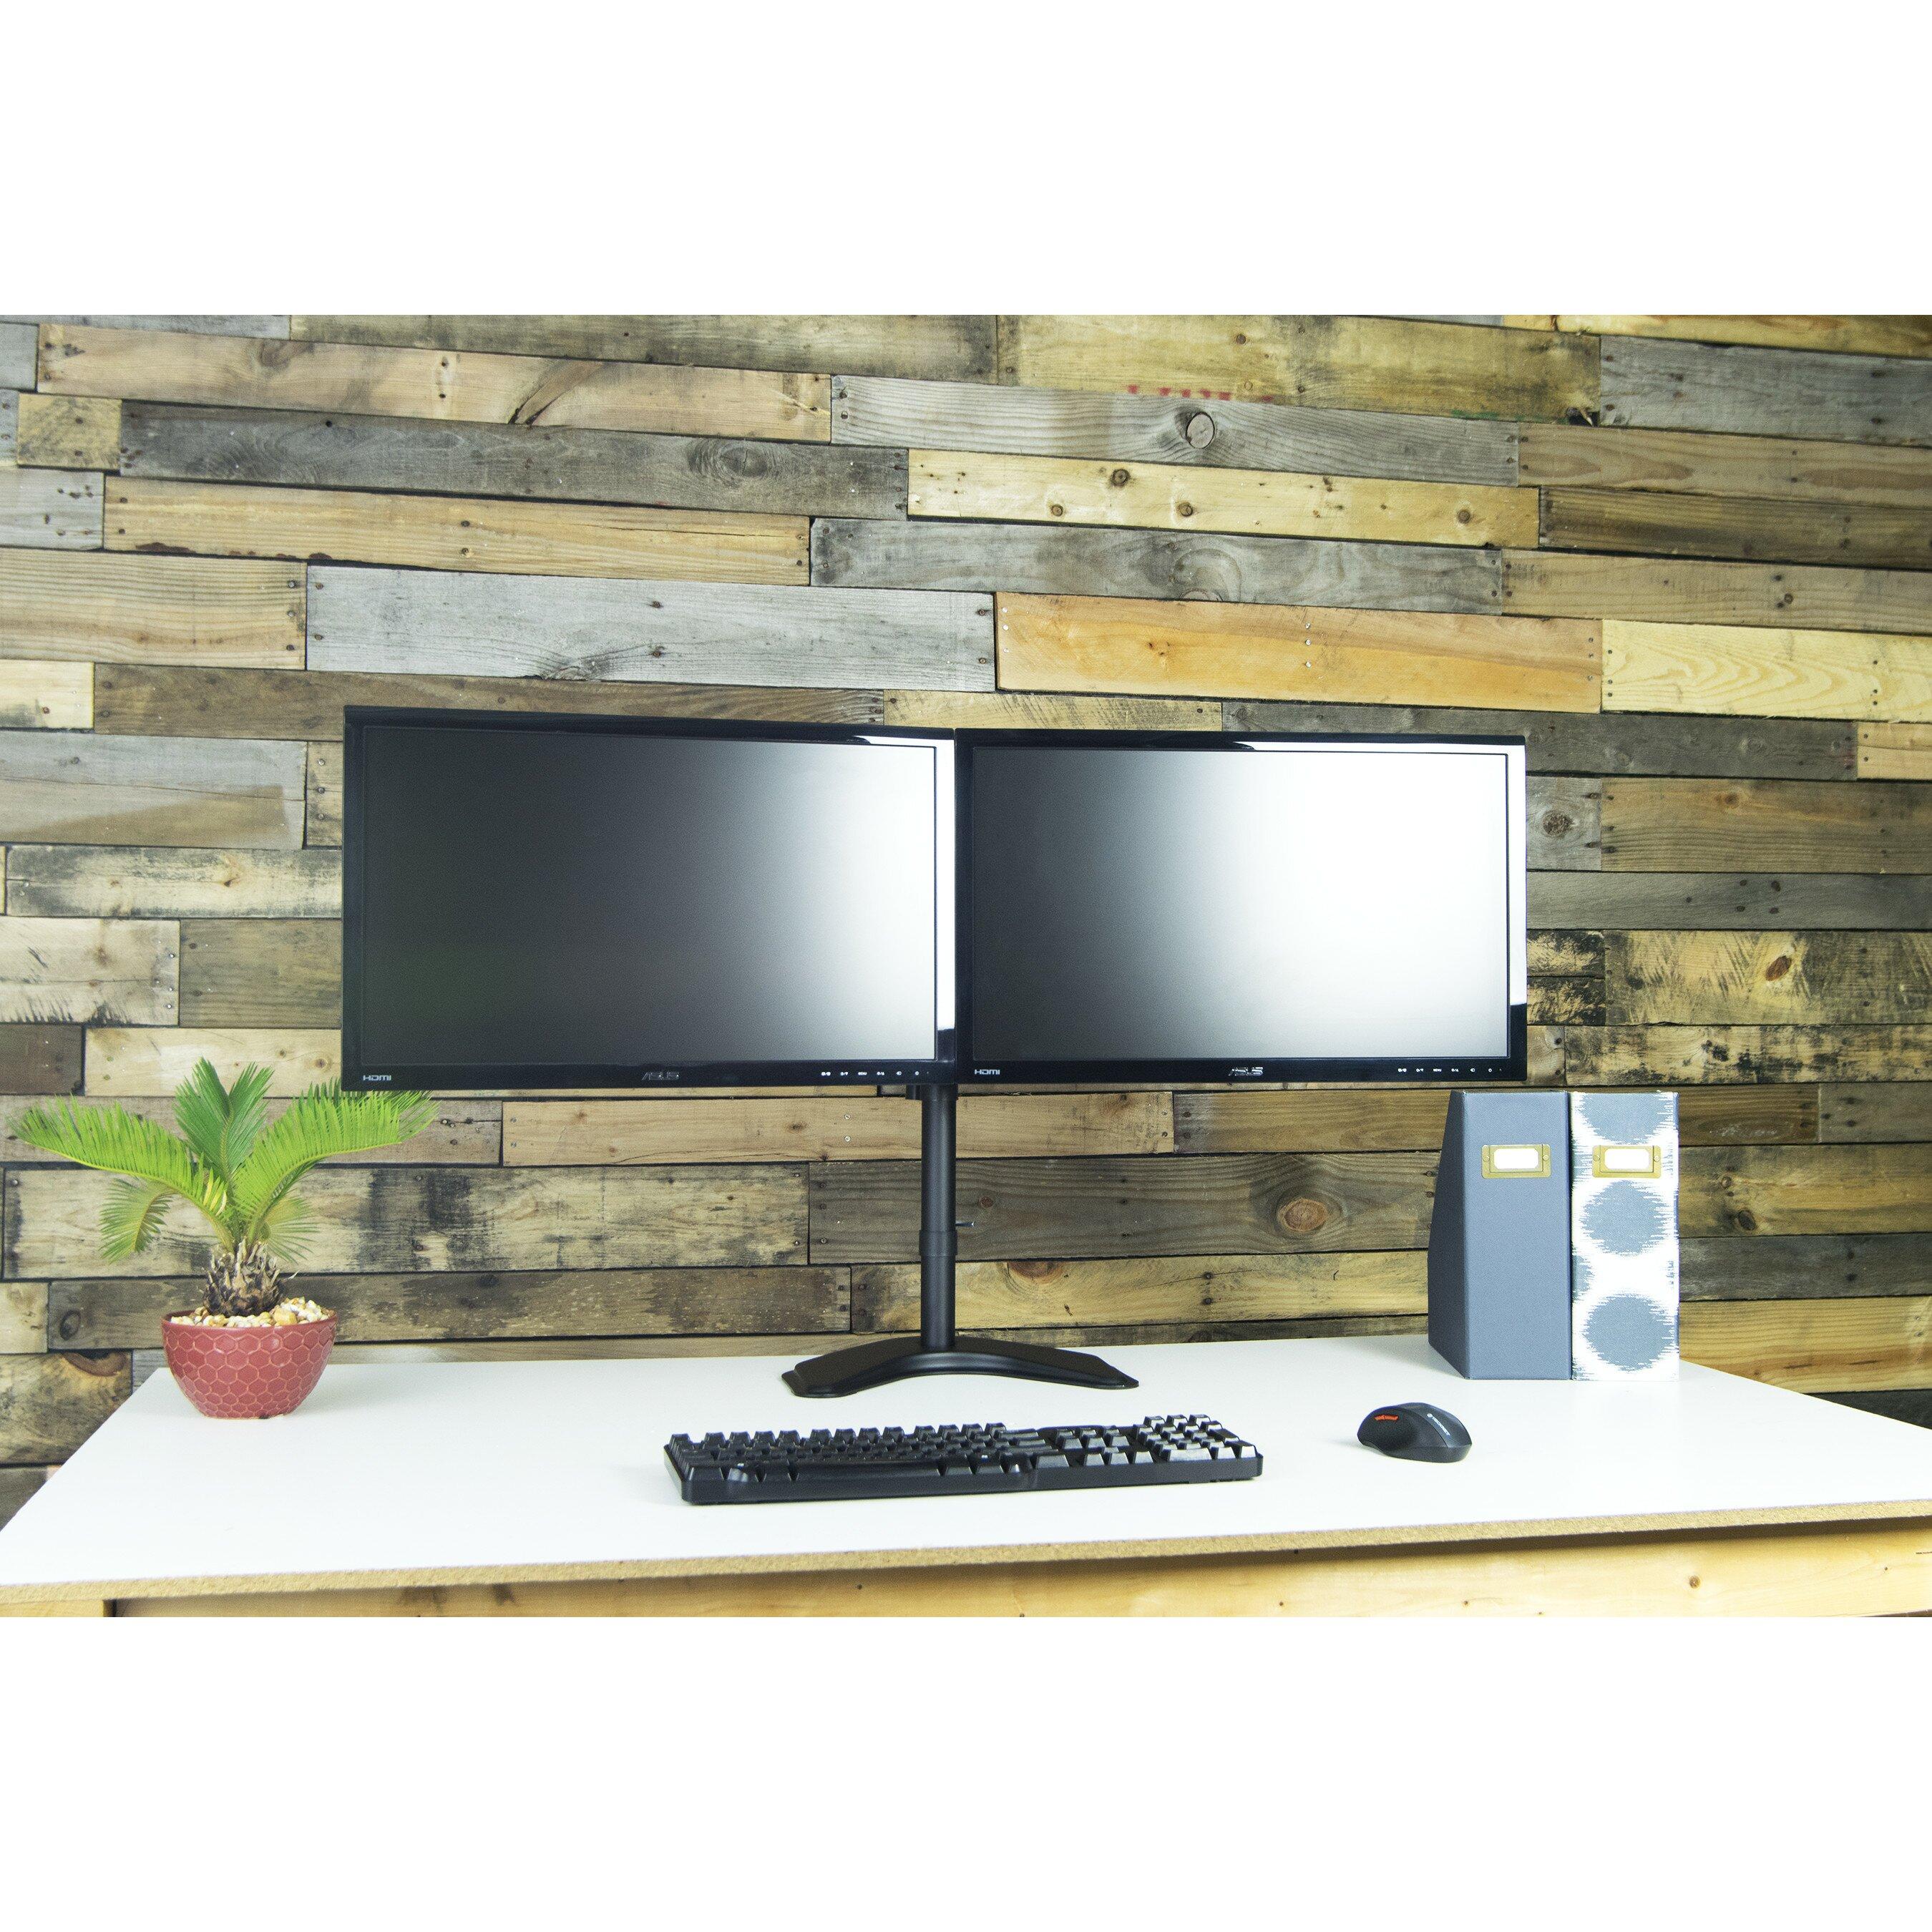 Vivo Dual Lcd Monitor Free Standing Height Adjustable 2